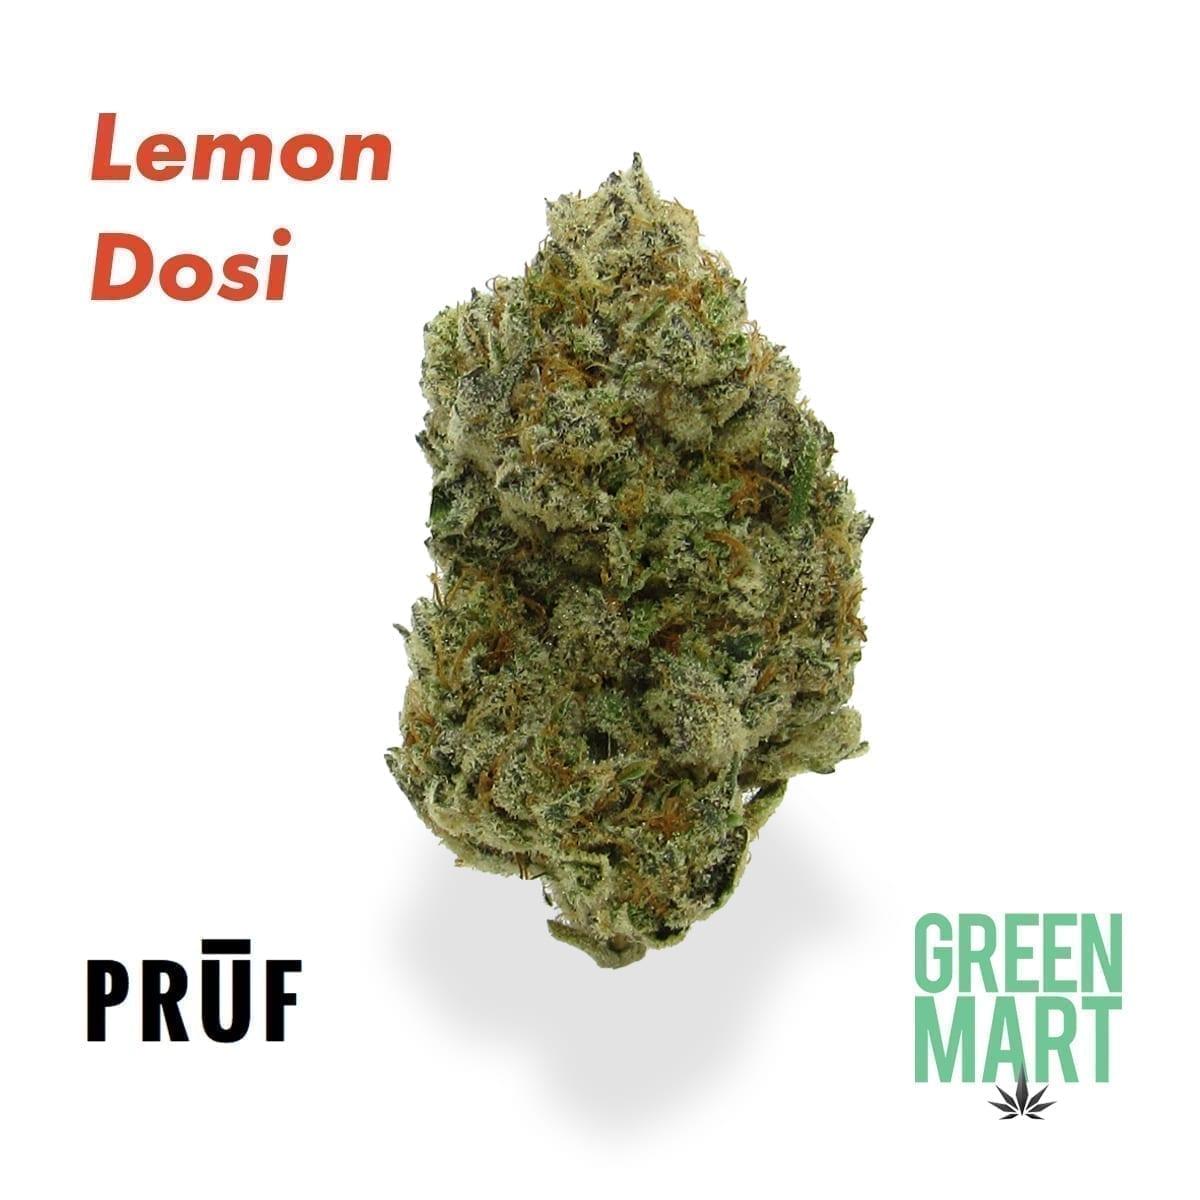 Lemon Dosi